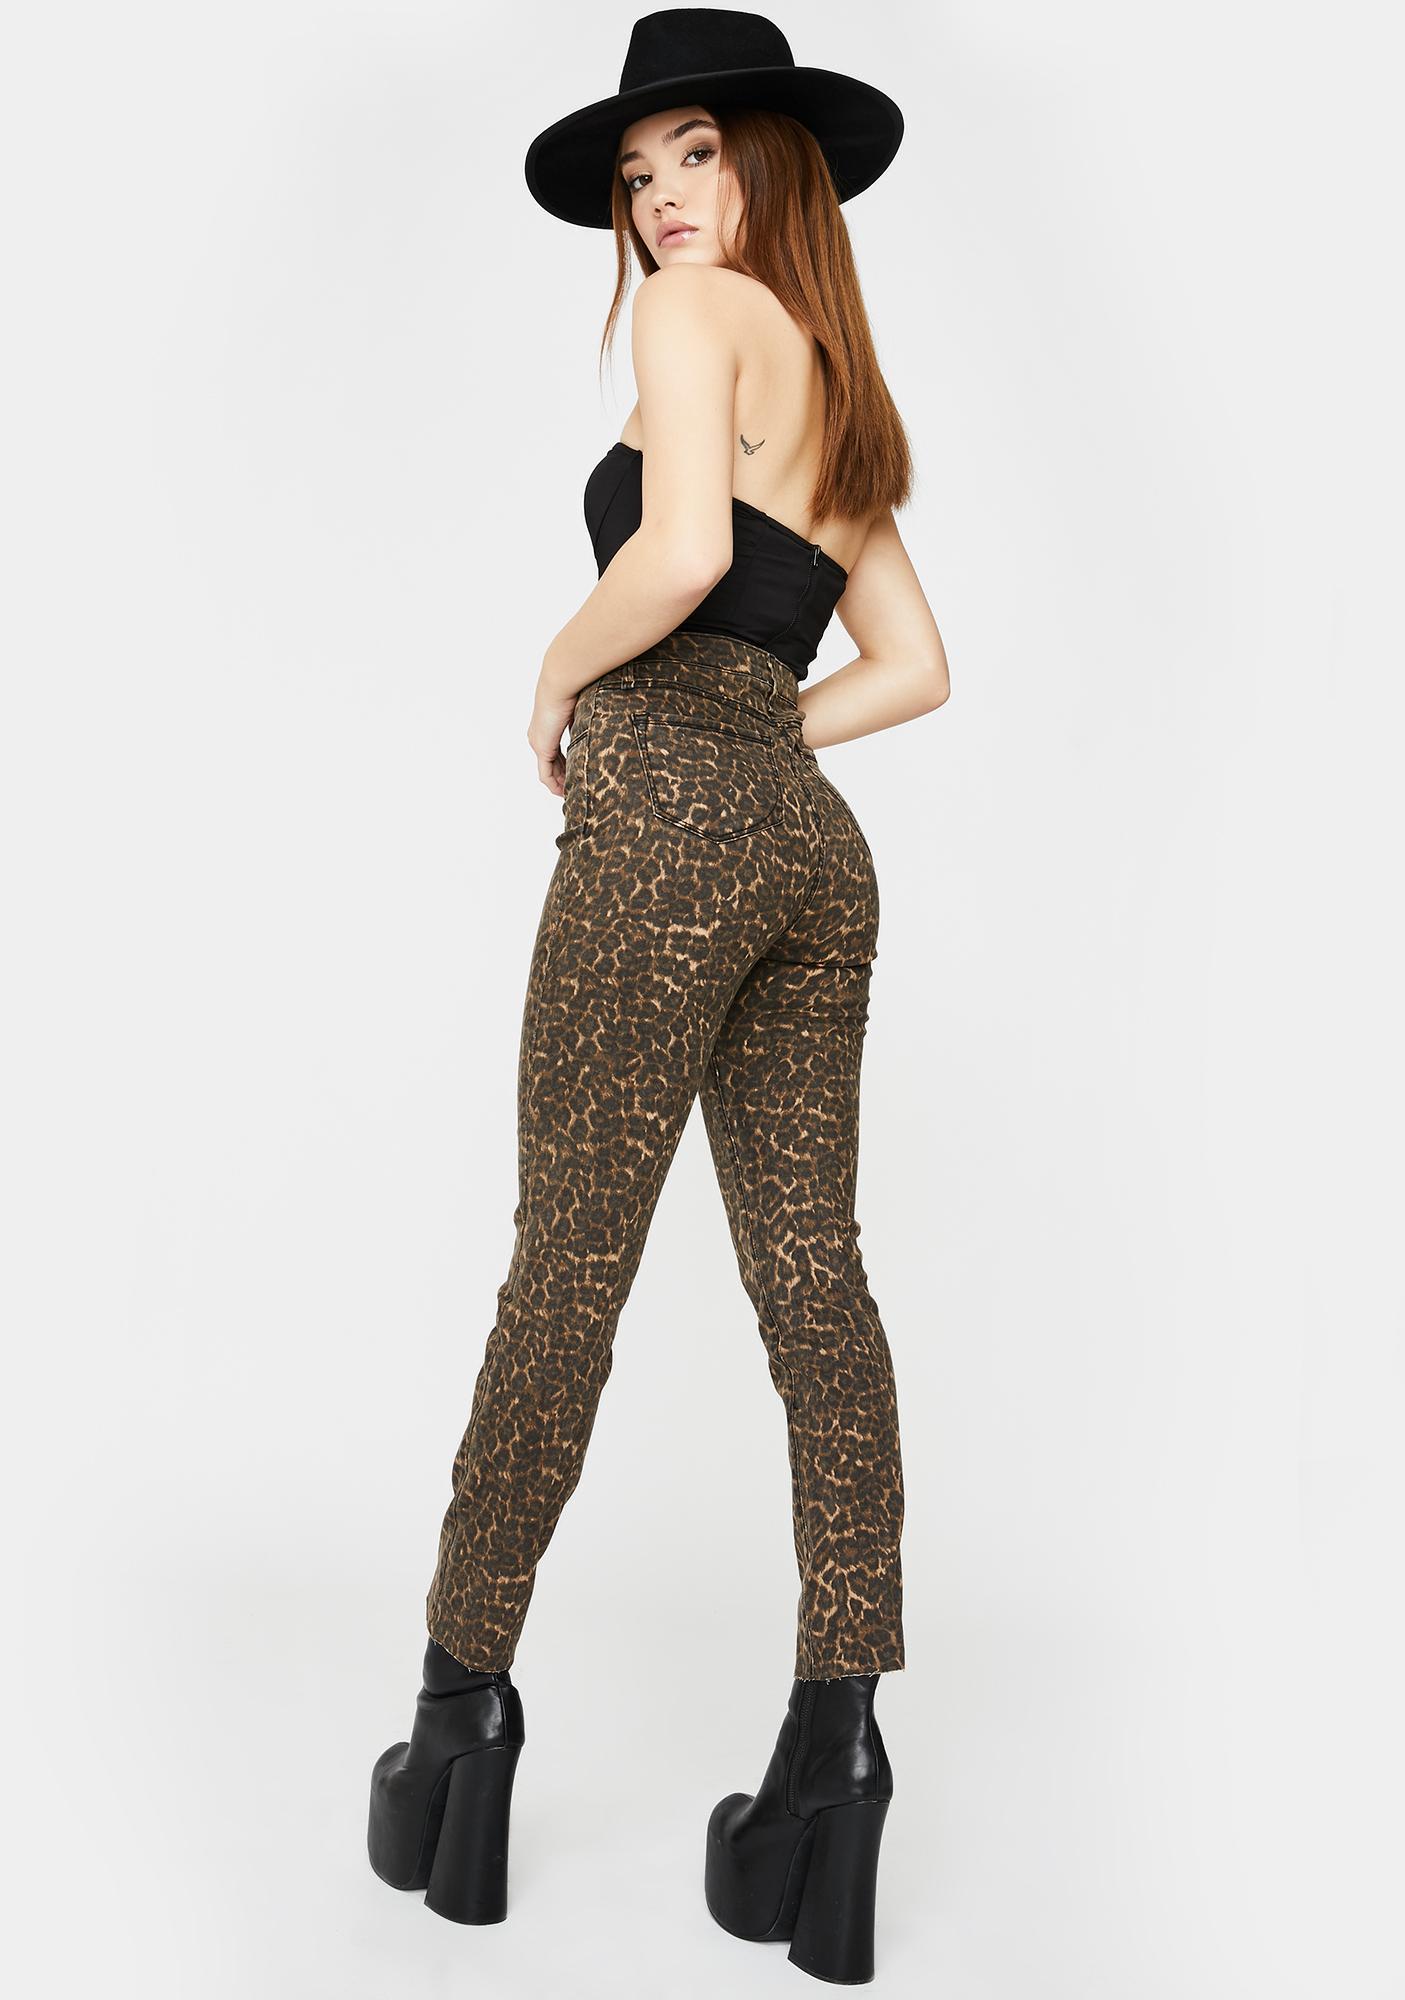 SNDYS. THE LABEL Feline Skinny Jeans